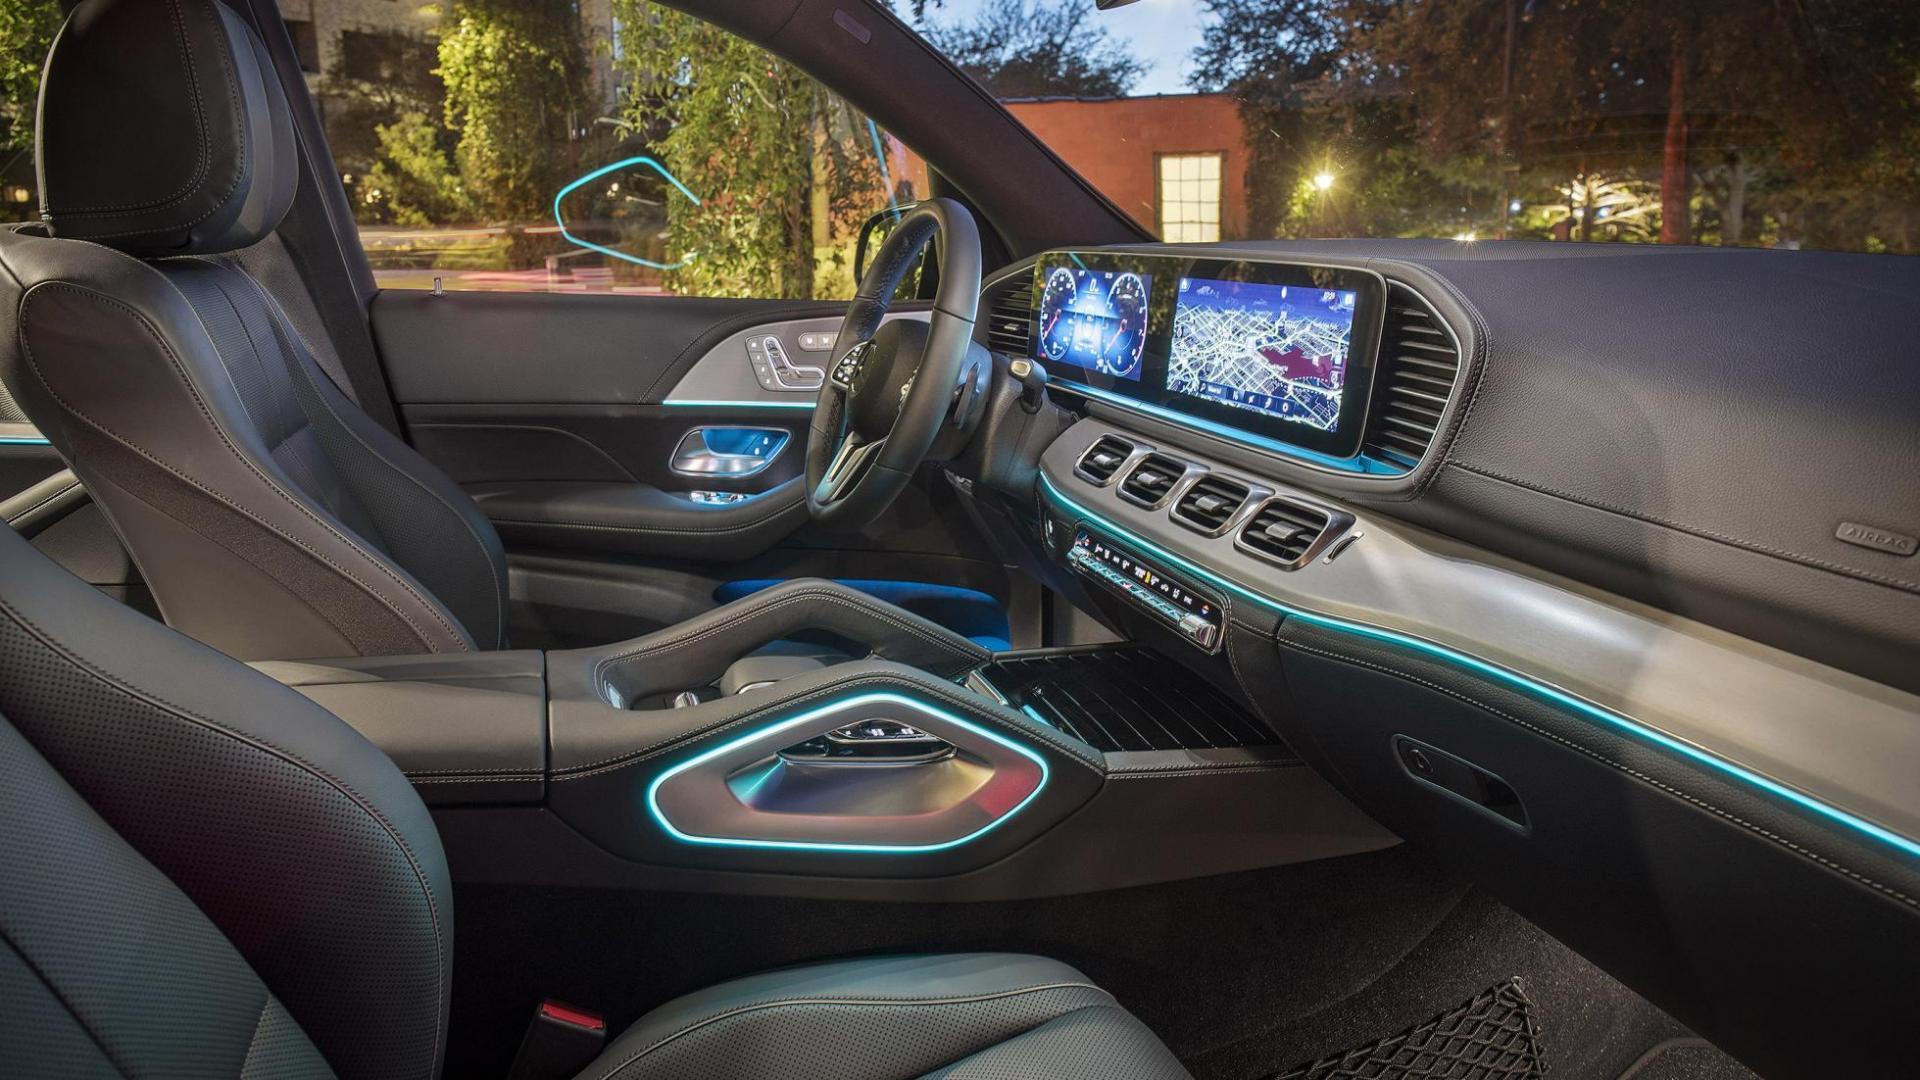 Mercedes-Benz GLE Interieur